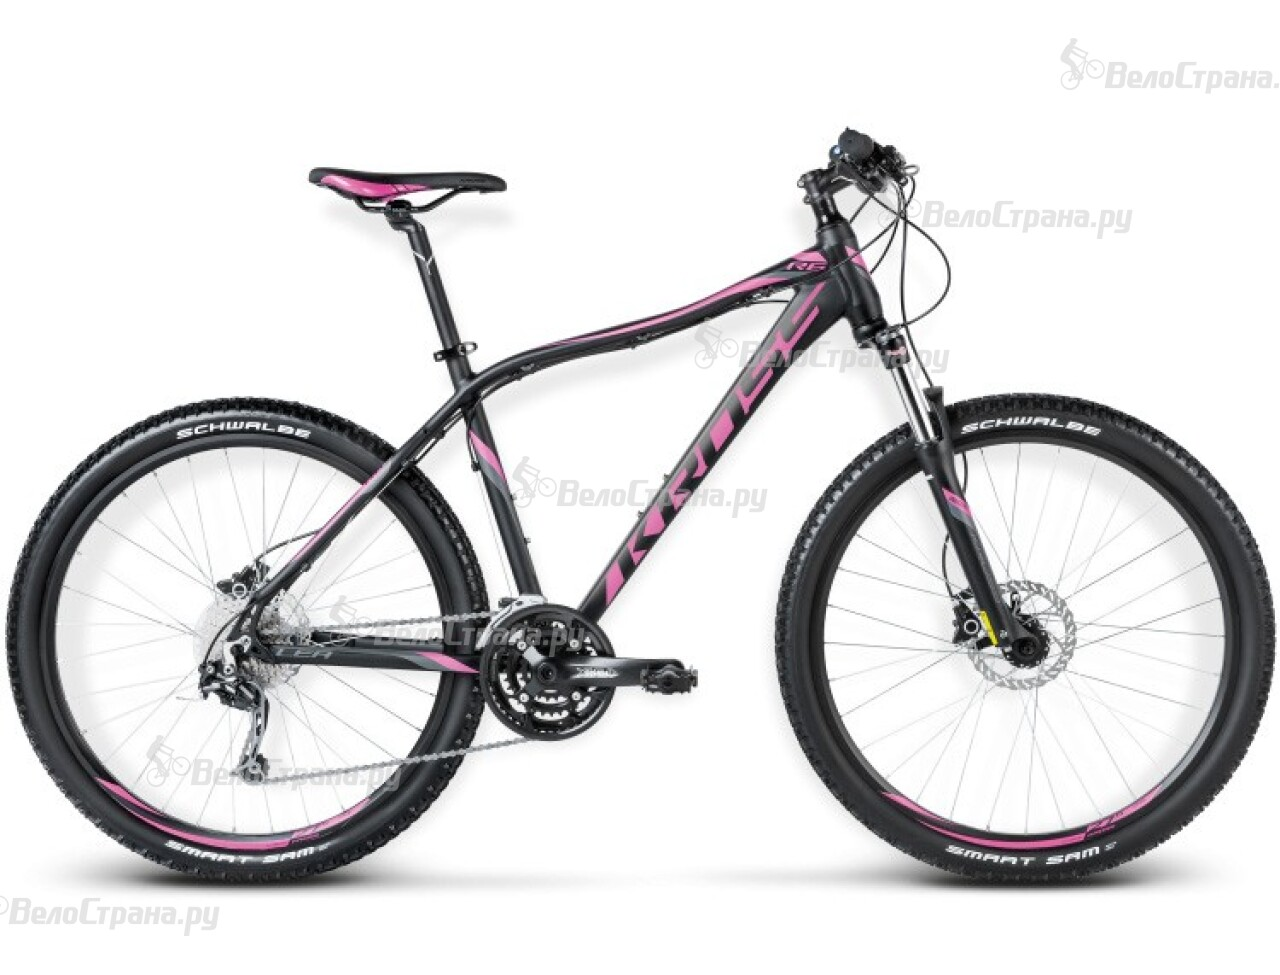 Велосипед Kross Lea R6 (2016) велосипед kross lea f4 2017